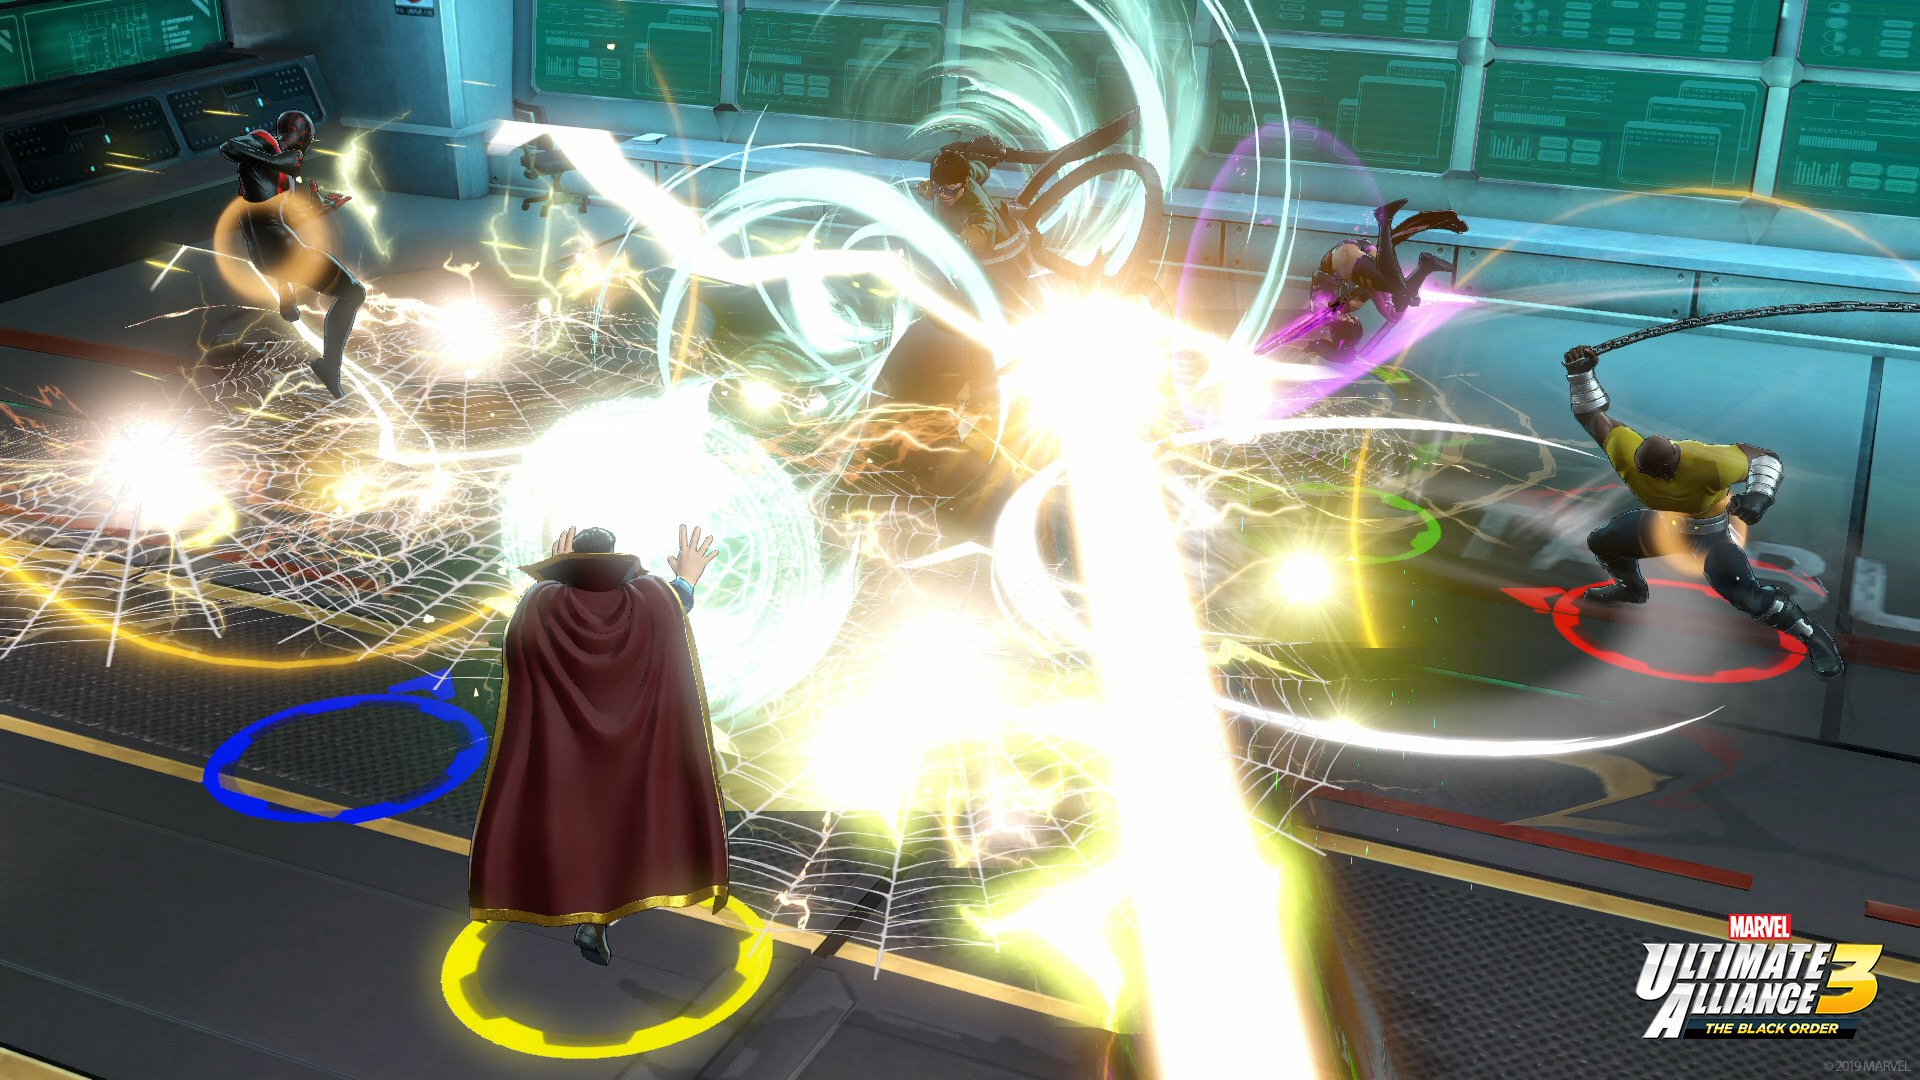 Marvel Ultimate Alliance 3: The Black Order E3 2019 Screenshot 7